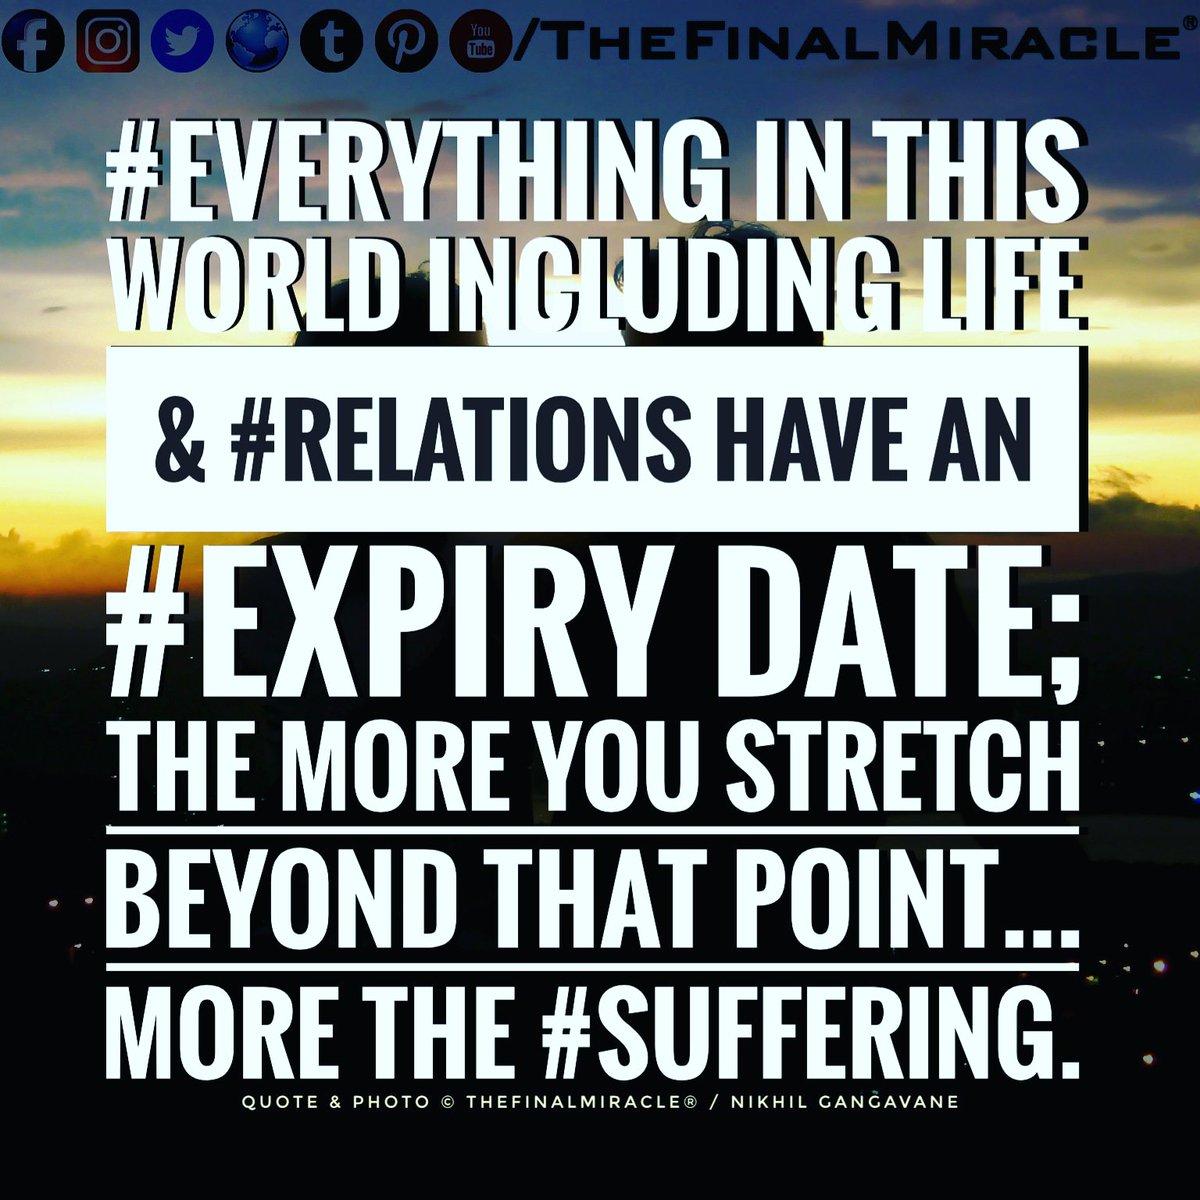 #TheFinalMiracle #NikhilGangavane #Quote #Quotes #Life #Death #MotivationalQuotes #motivationalspeaker #motivation #Inspiration #Inspirational #belief #Wisdom #wisdomquotes #wisdomgoals #Relationship #relation #relationshipmemes #relationships #relationshipgoals #quoteoftheday